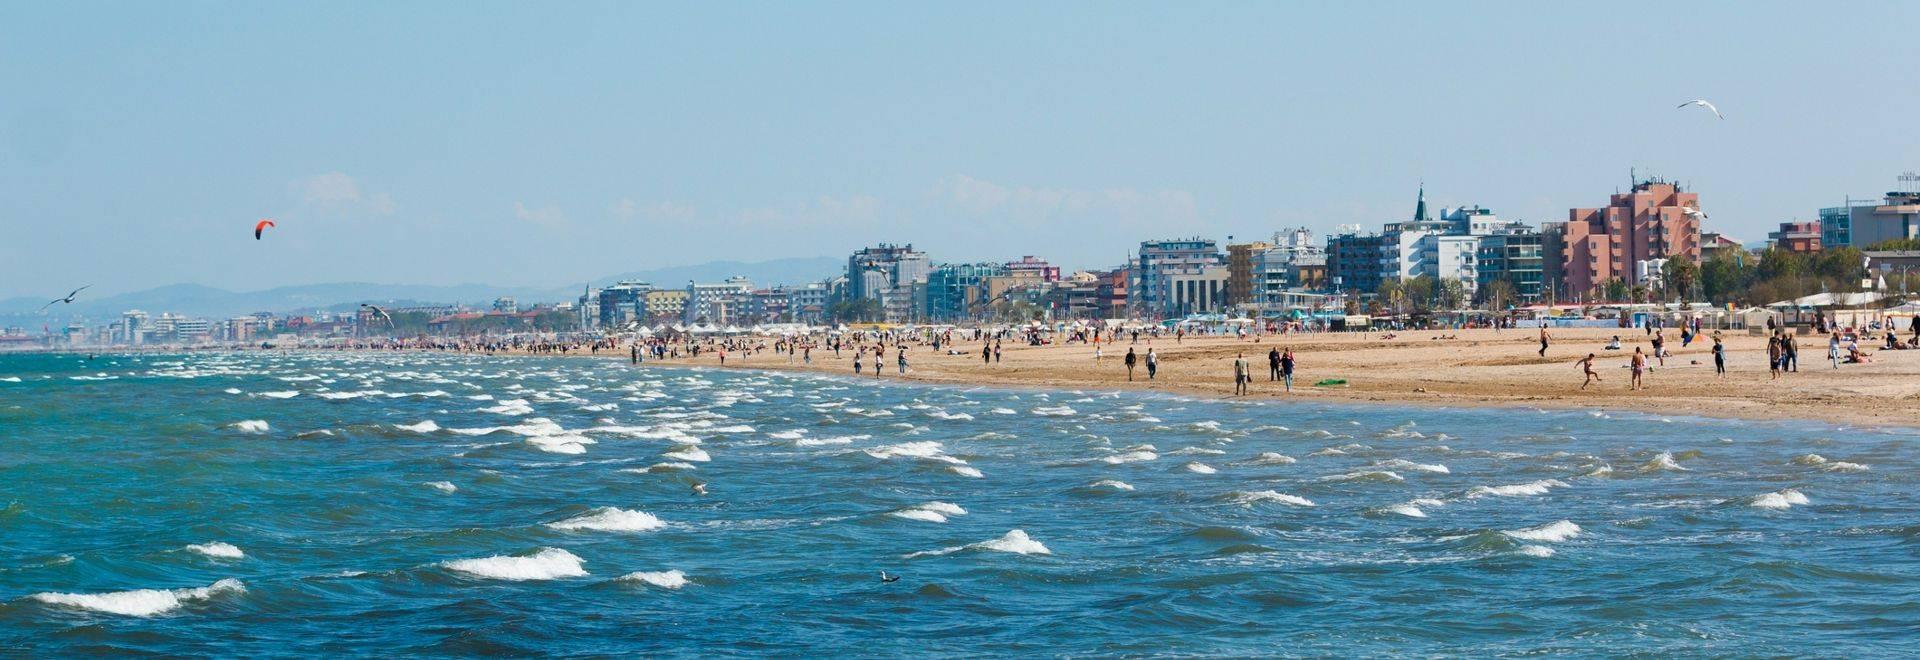 A beach in Adriatic sea in Rimini, Italy